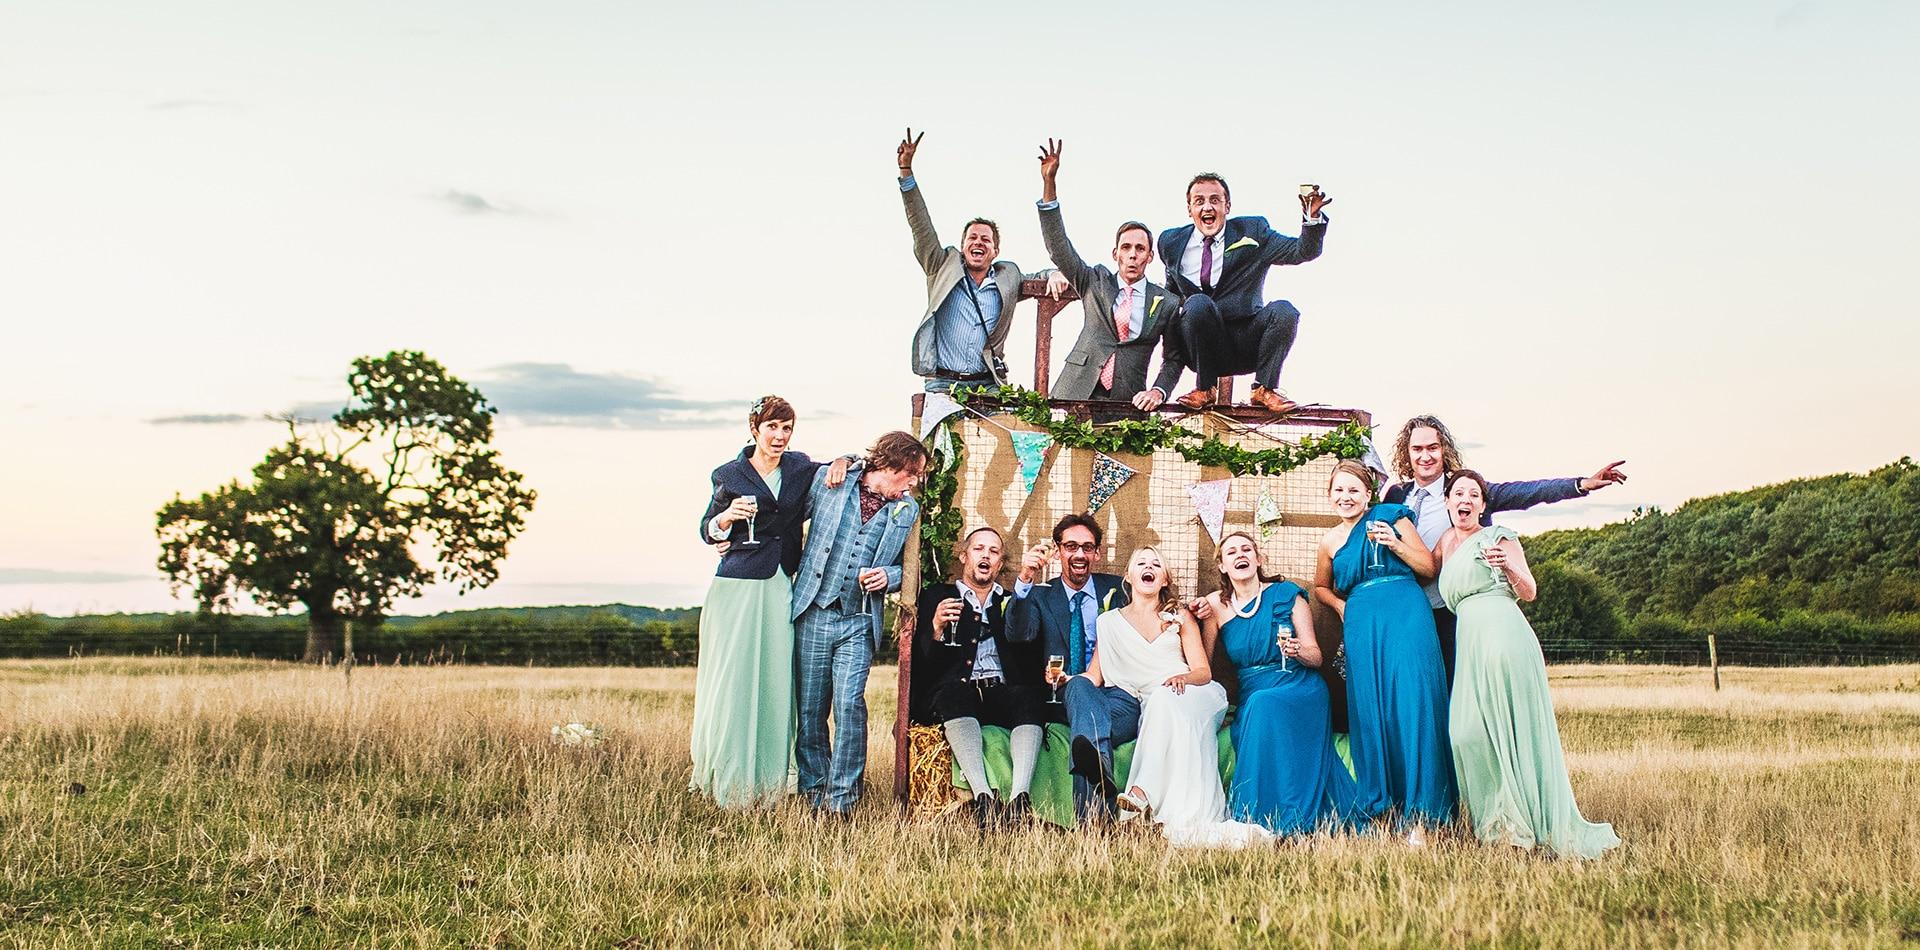 Weddings-at-Godwick-Hall-and-Great-Barn-Norfolk